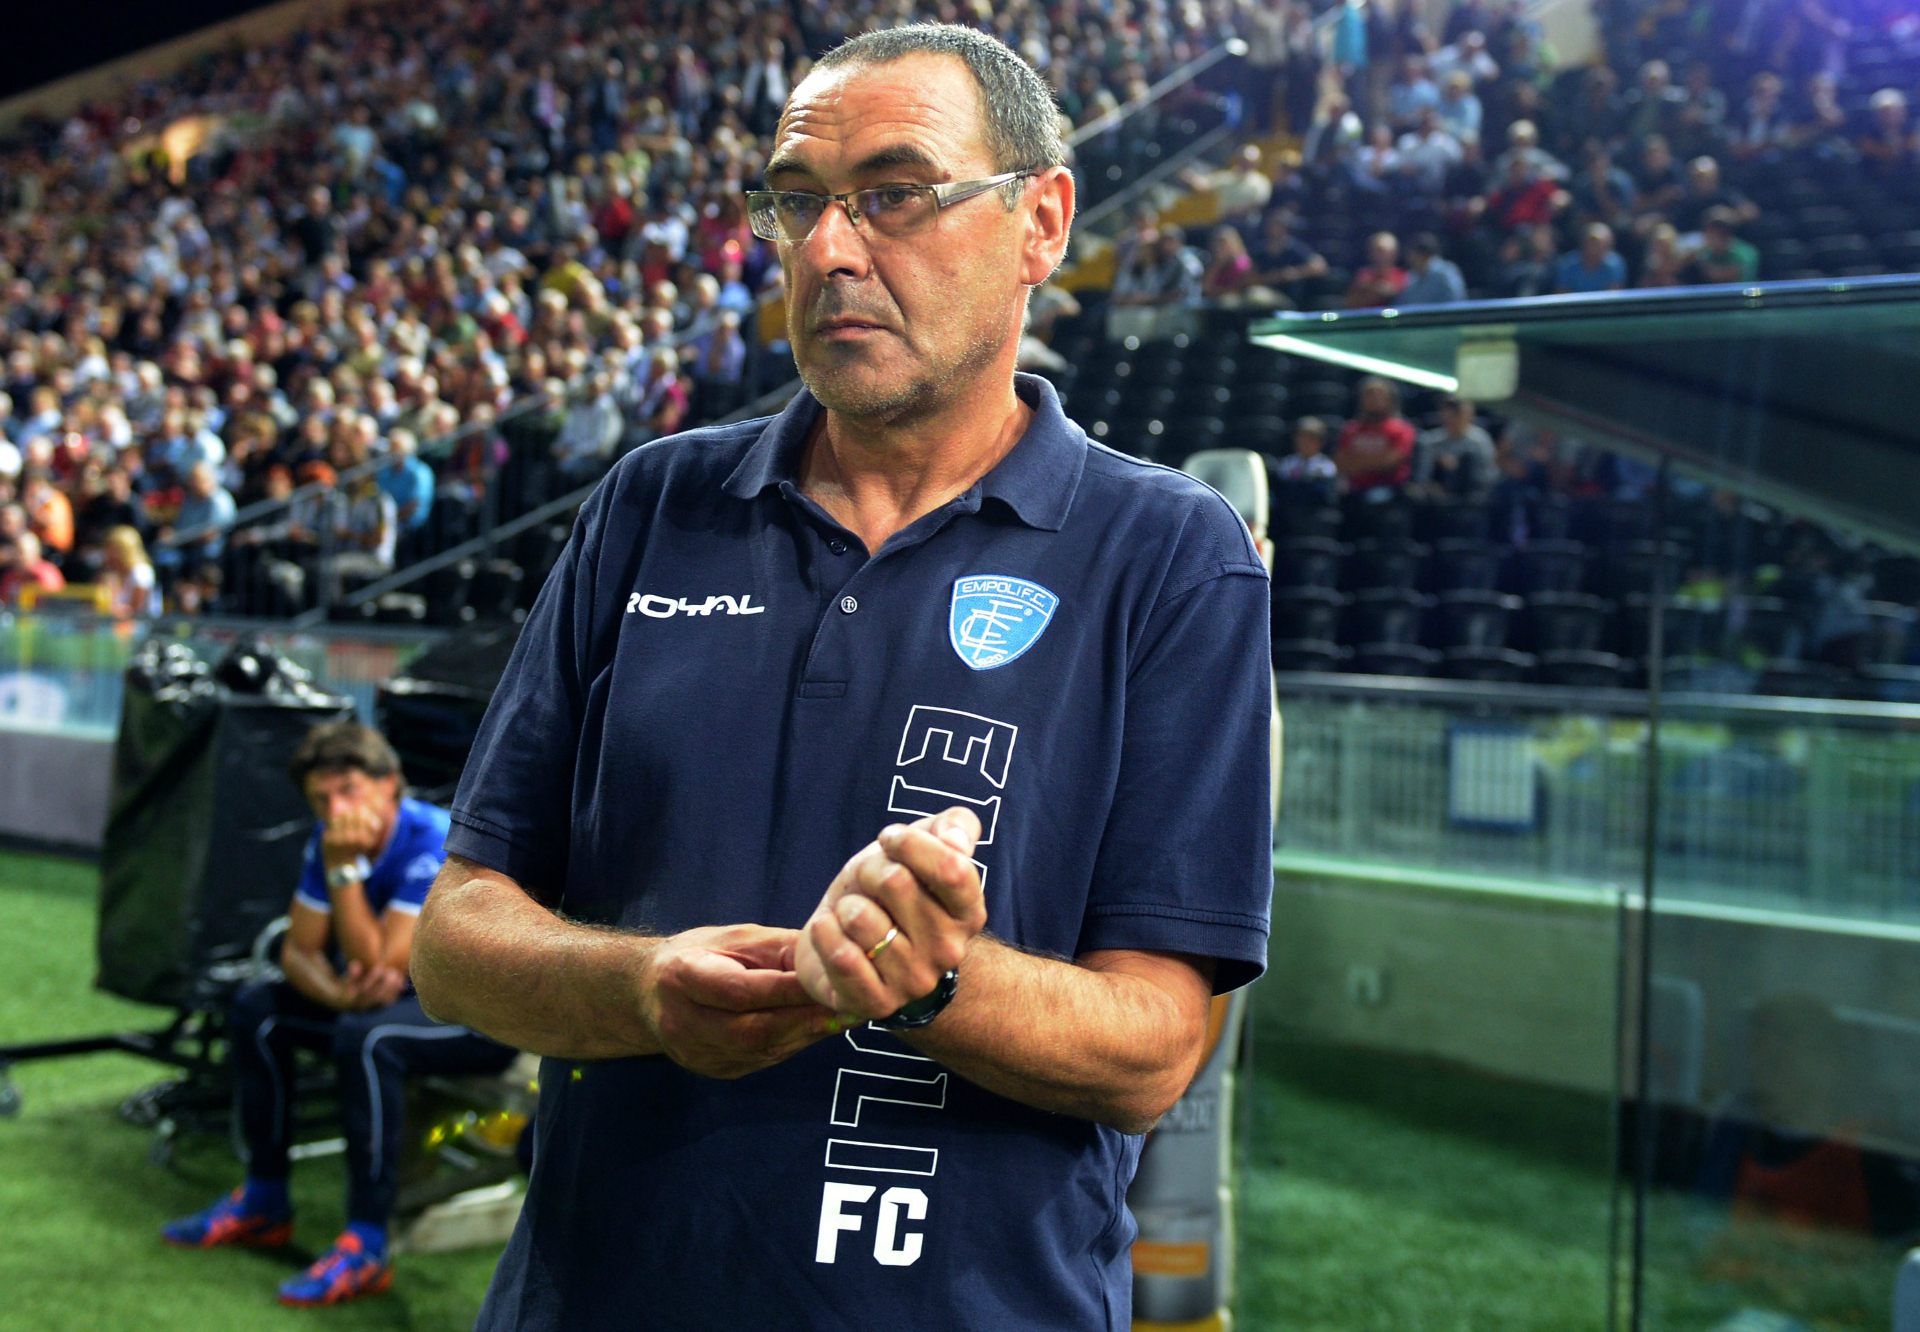 Maurizio Sarri Empoli